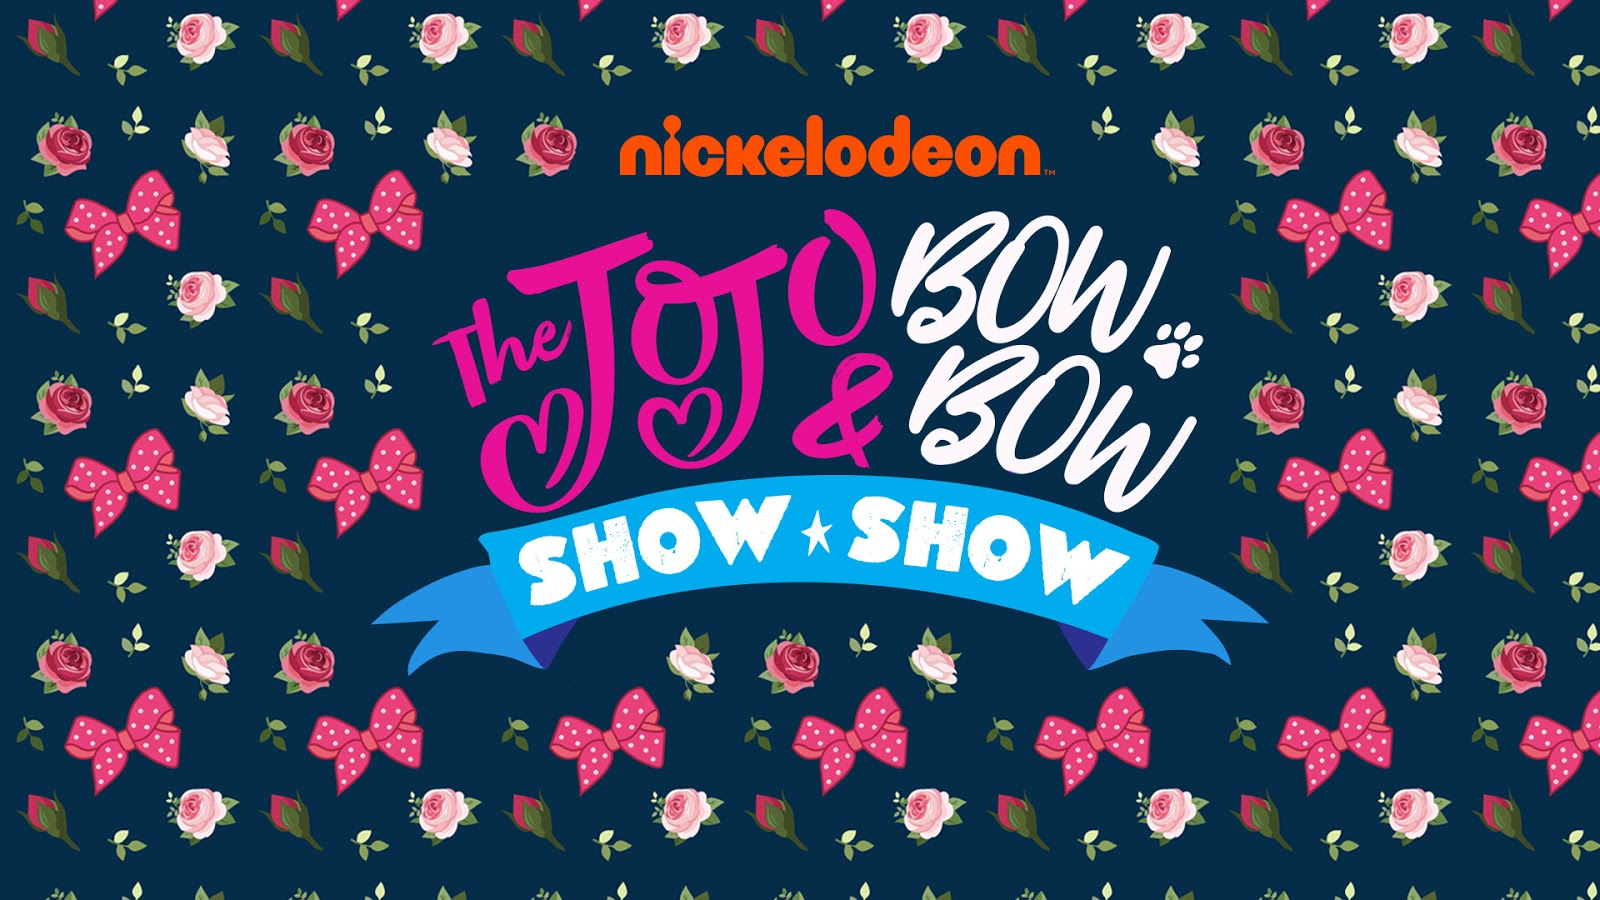 The JoJo & Bow Bow Show Show